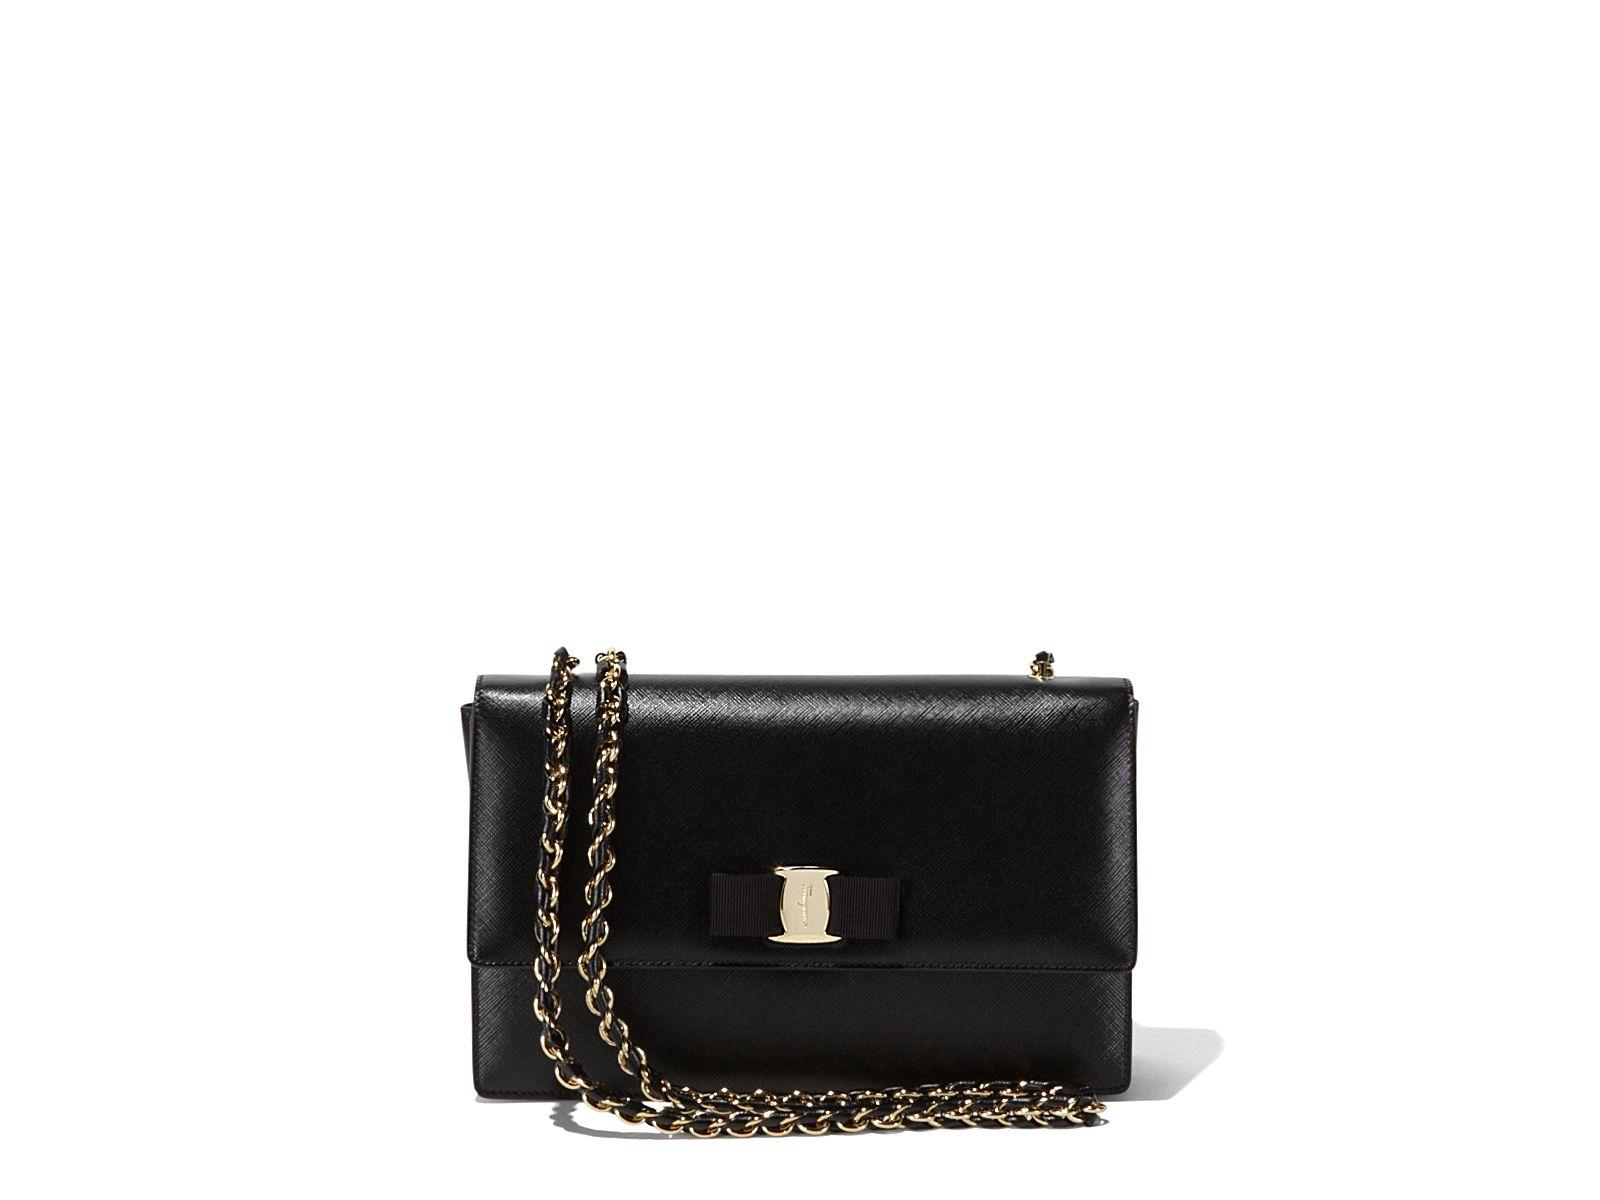 8c60758b0f Medium Vara Flap Bag - Handbags - Women - Salvatore Ferragamo ...